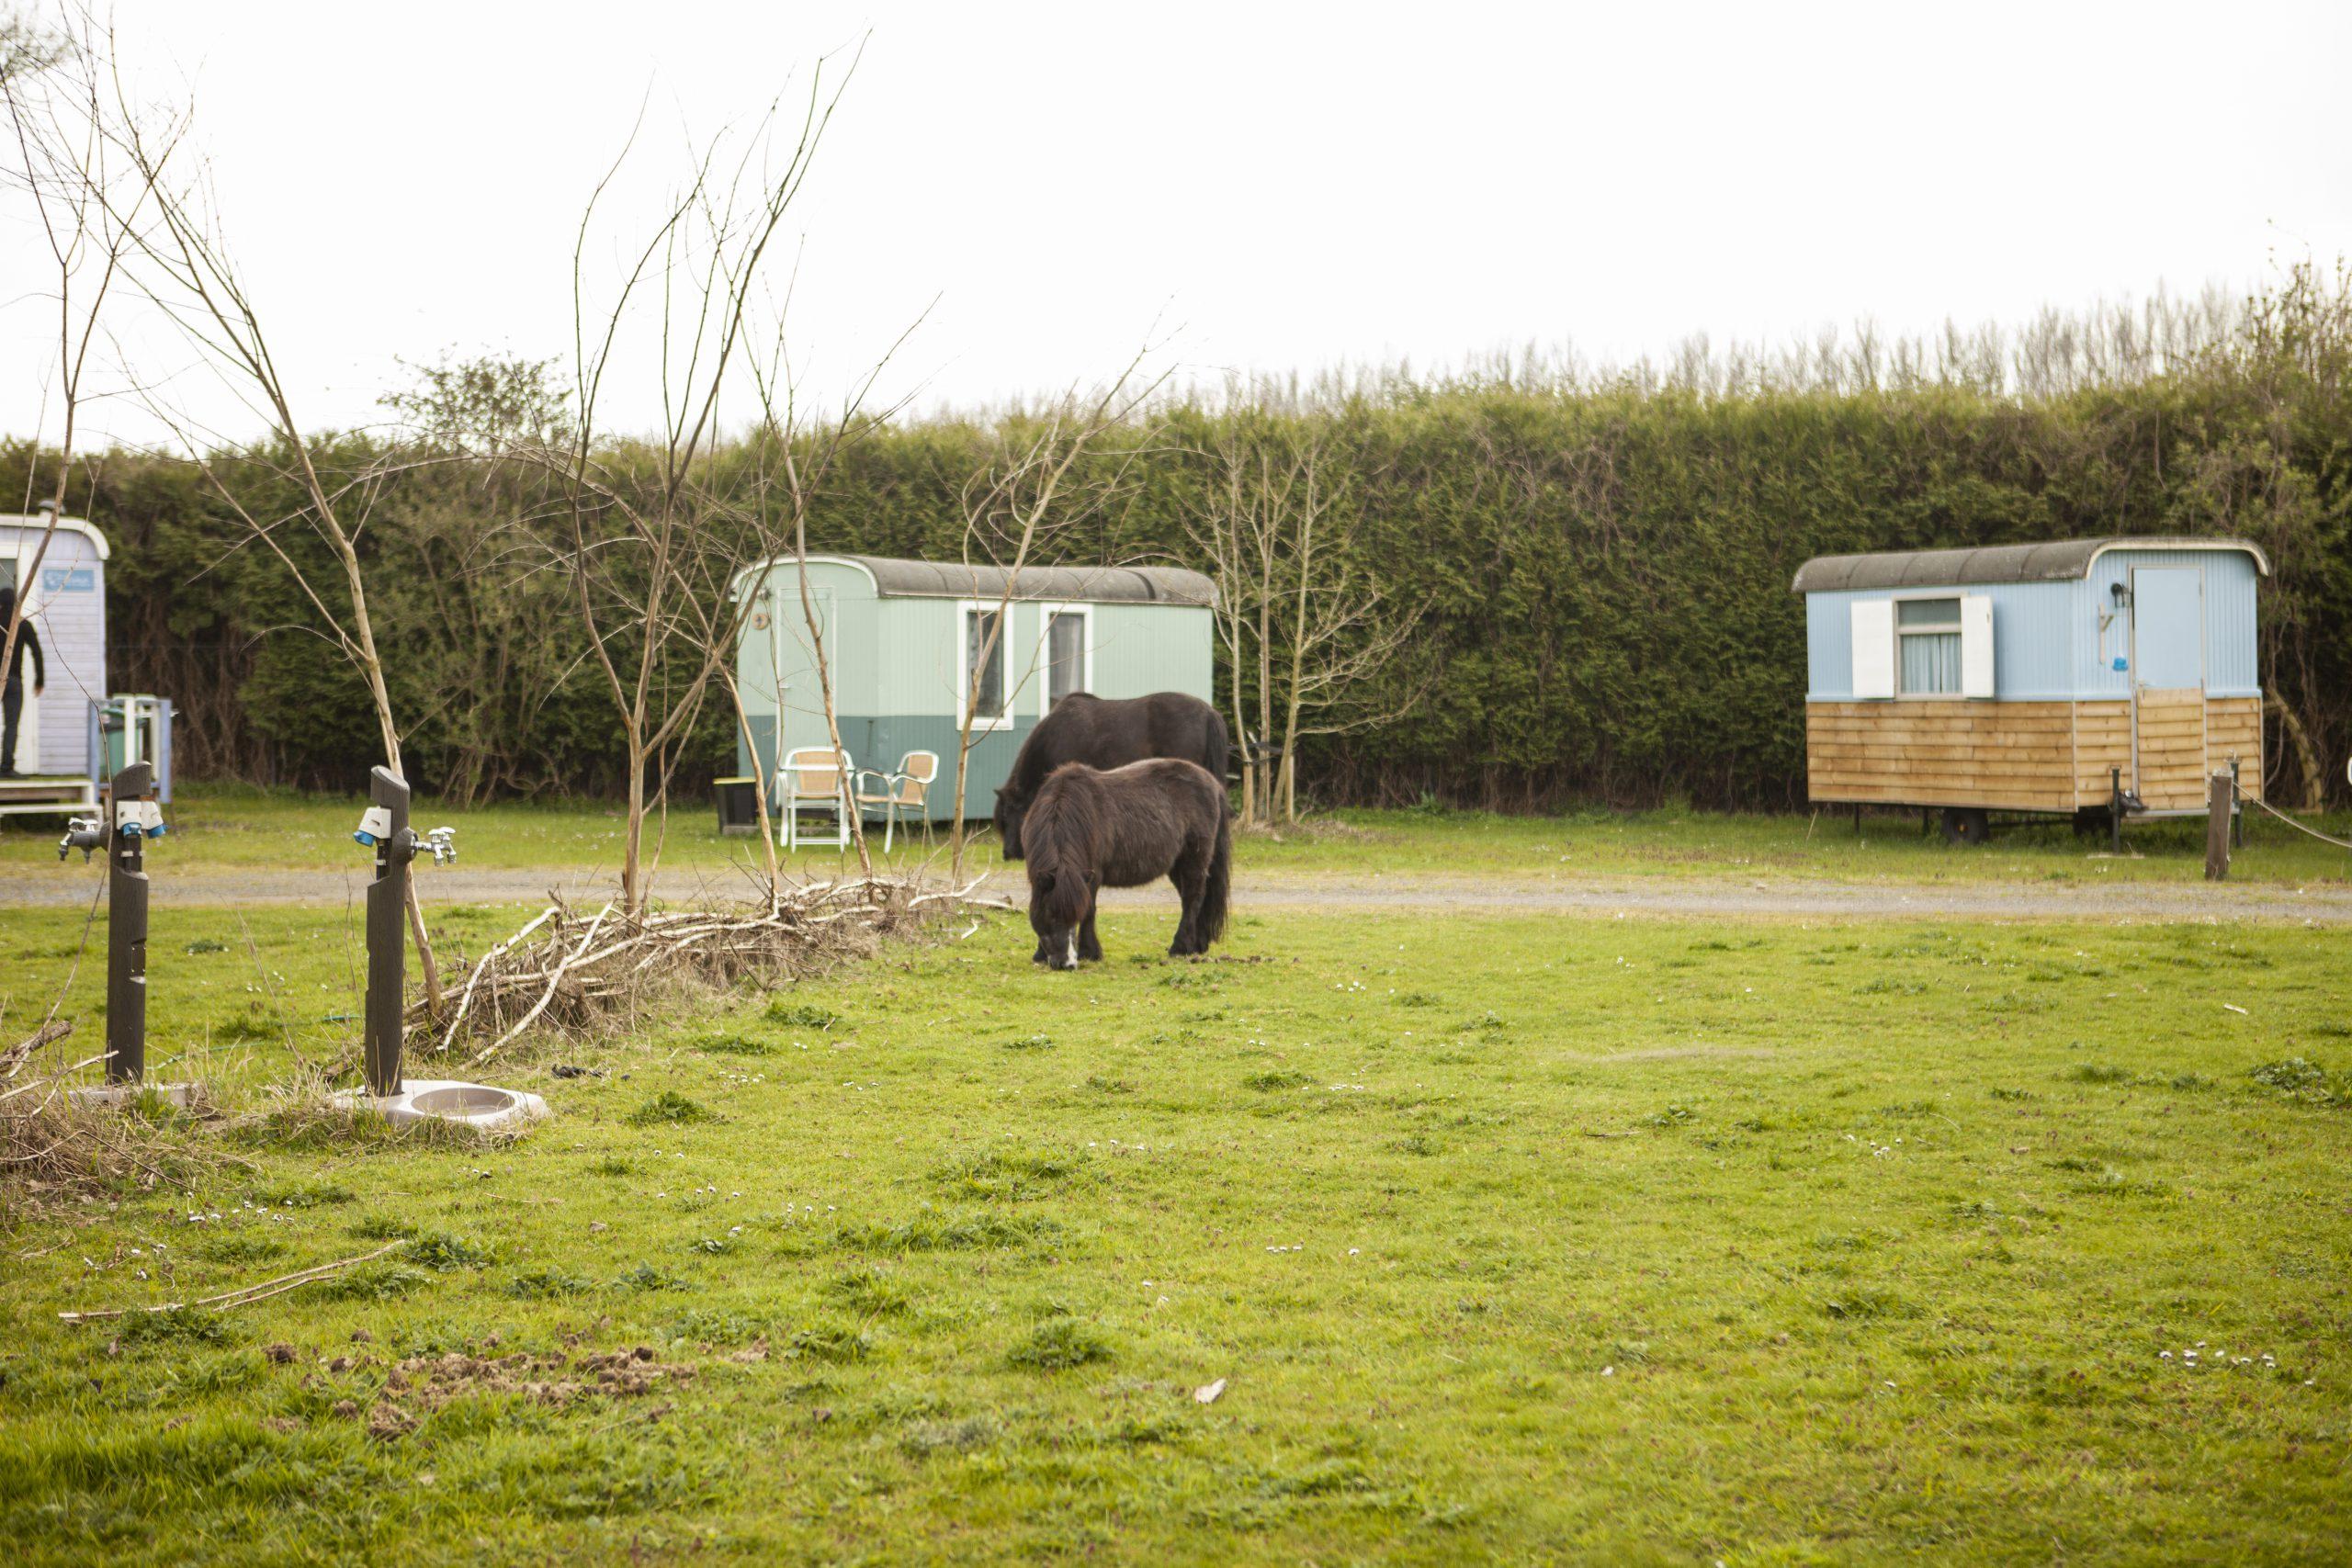 Camping-miniboerderijcamping-minicamping-pipowagens-huren-airbnb-hof-van-axel